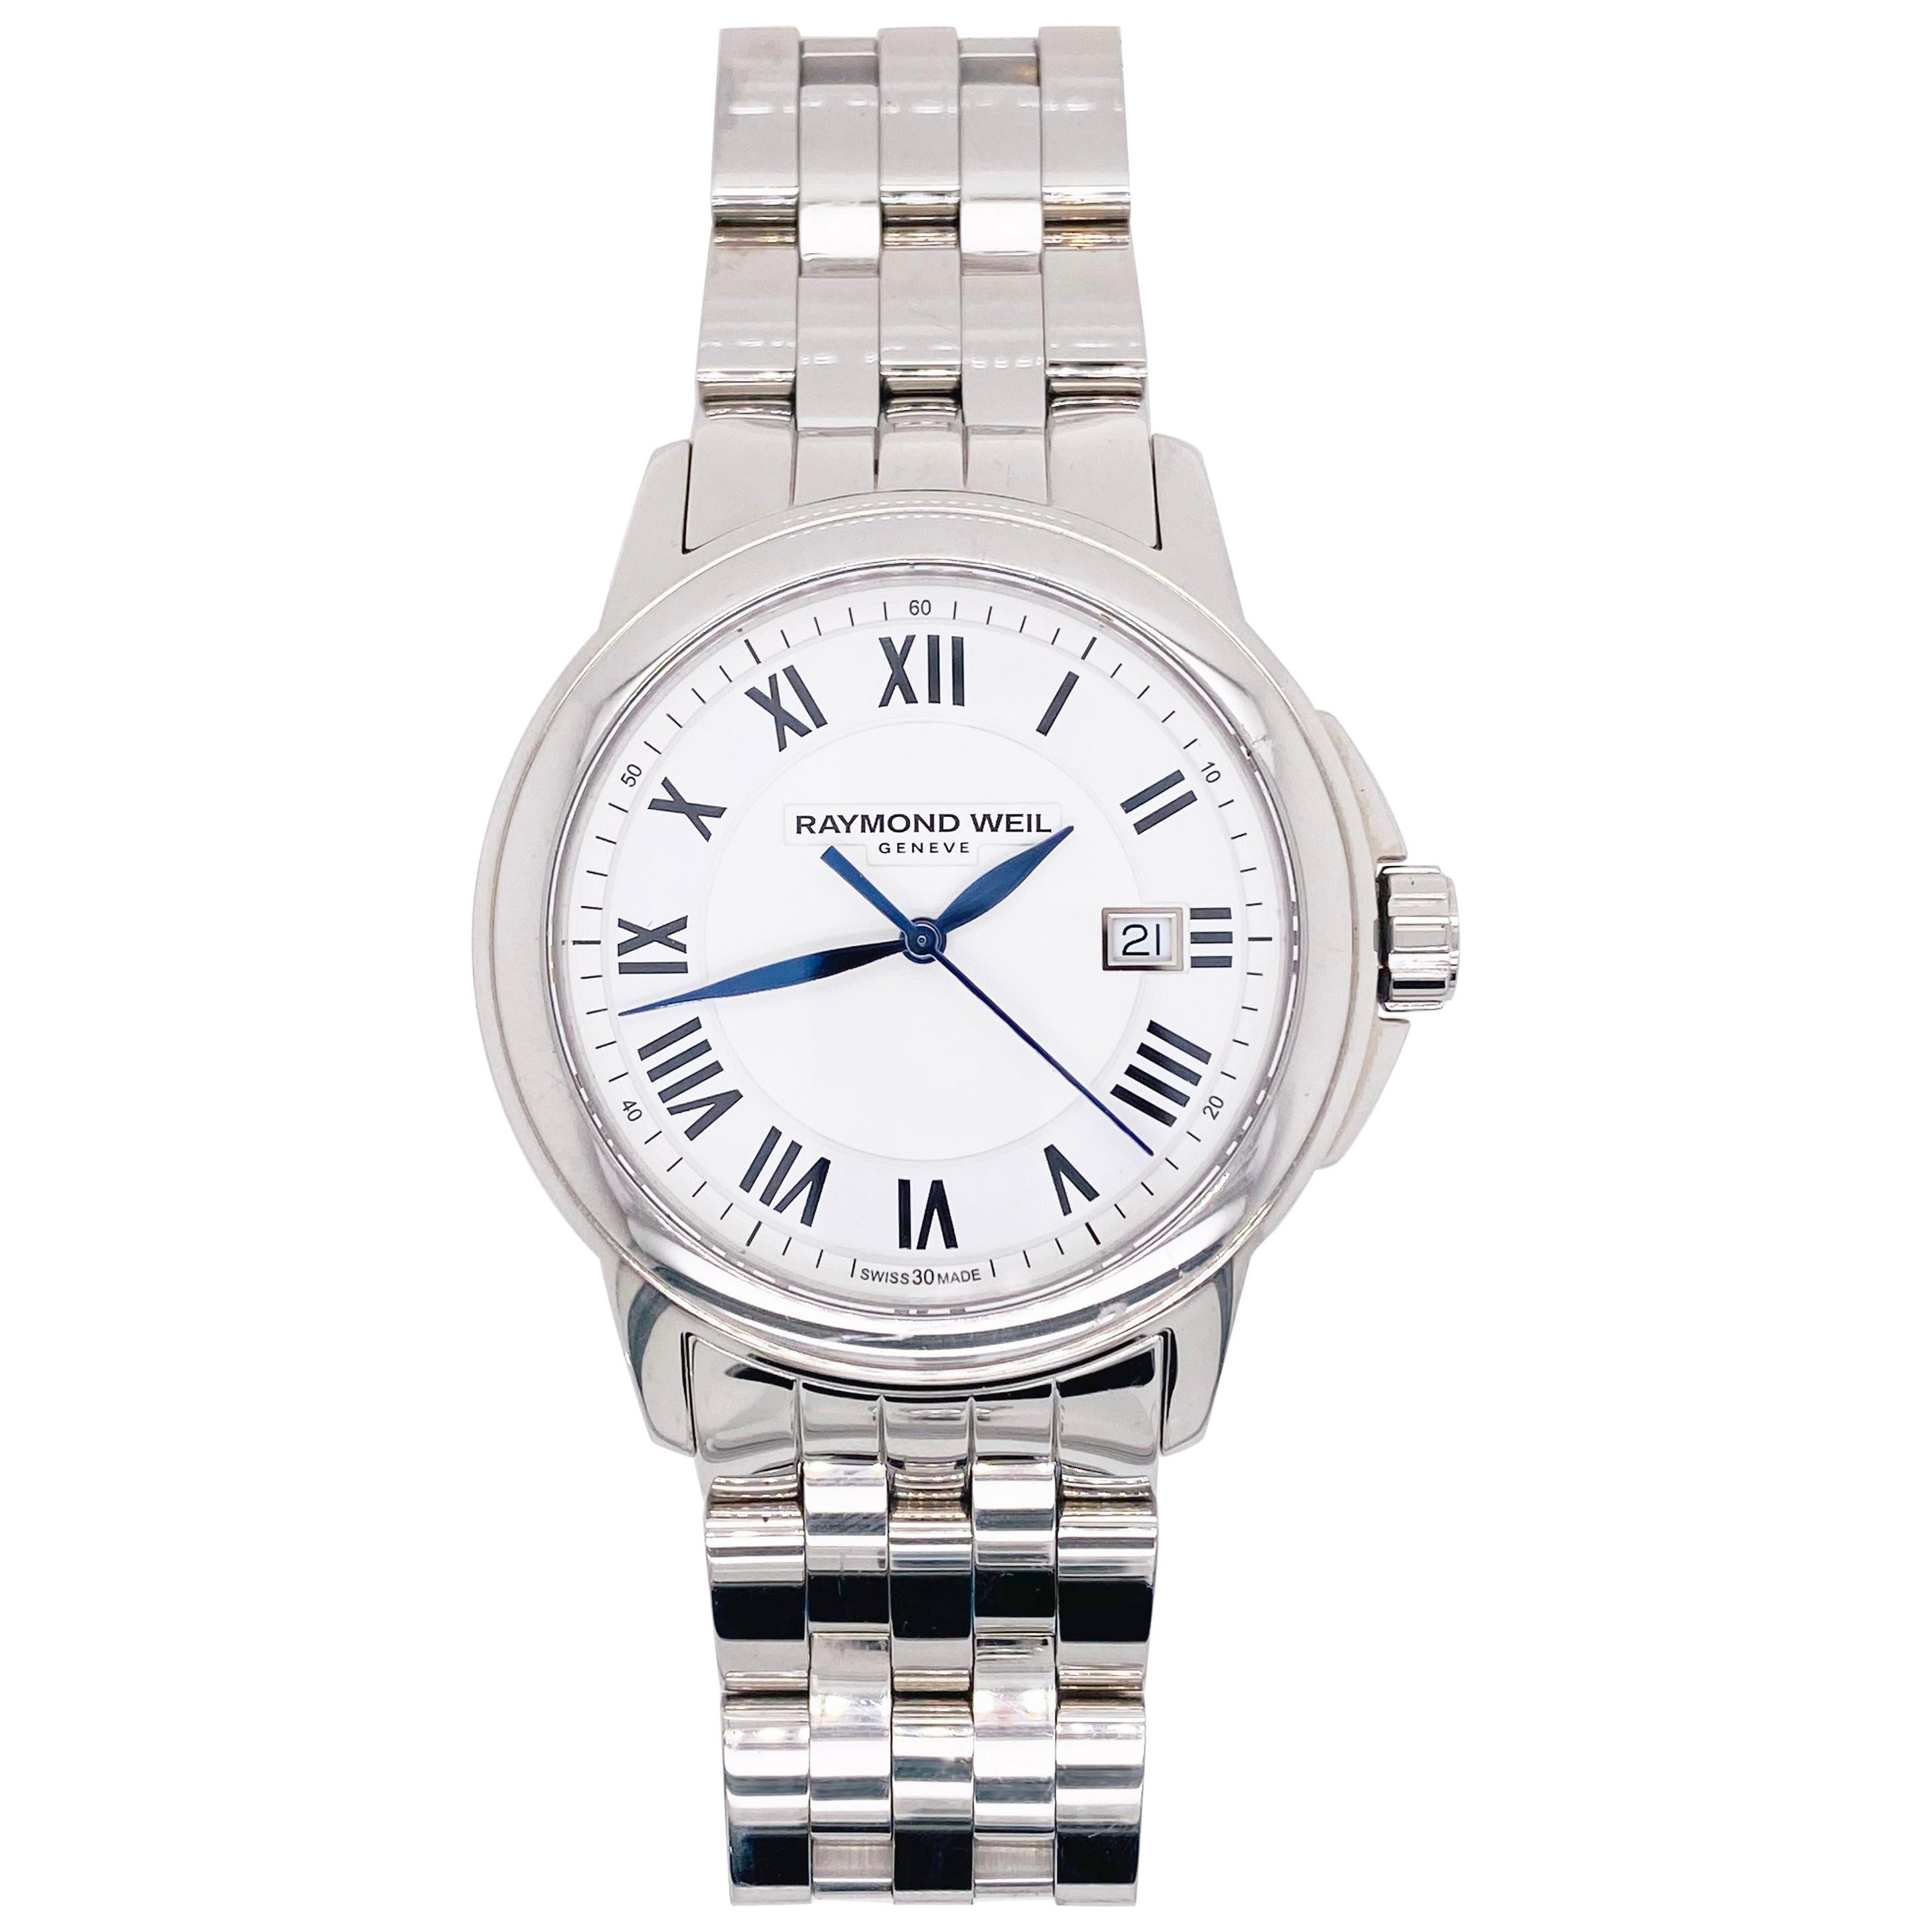 Raymond Weil Watch, Genève Stainless Steel Sapphire Crystal, Swiss Made, Blue RW